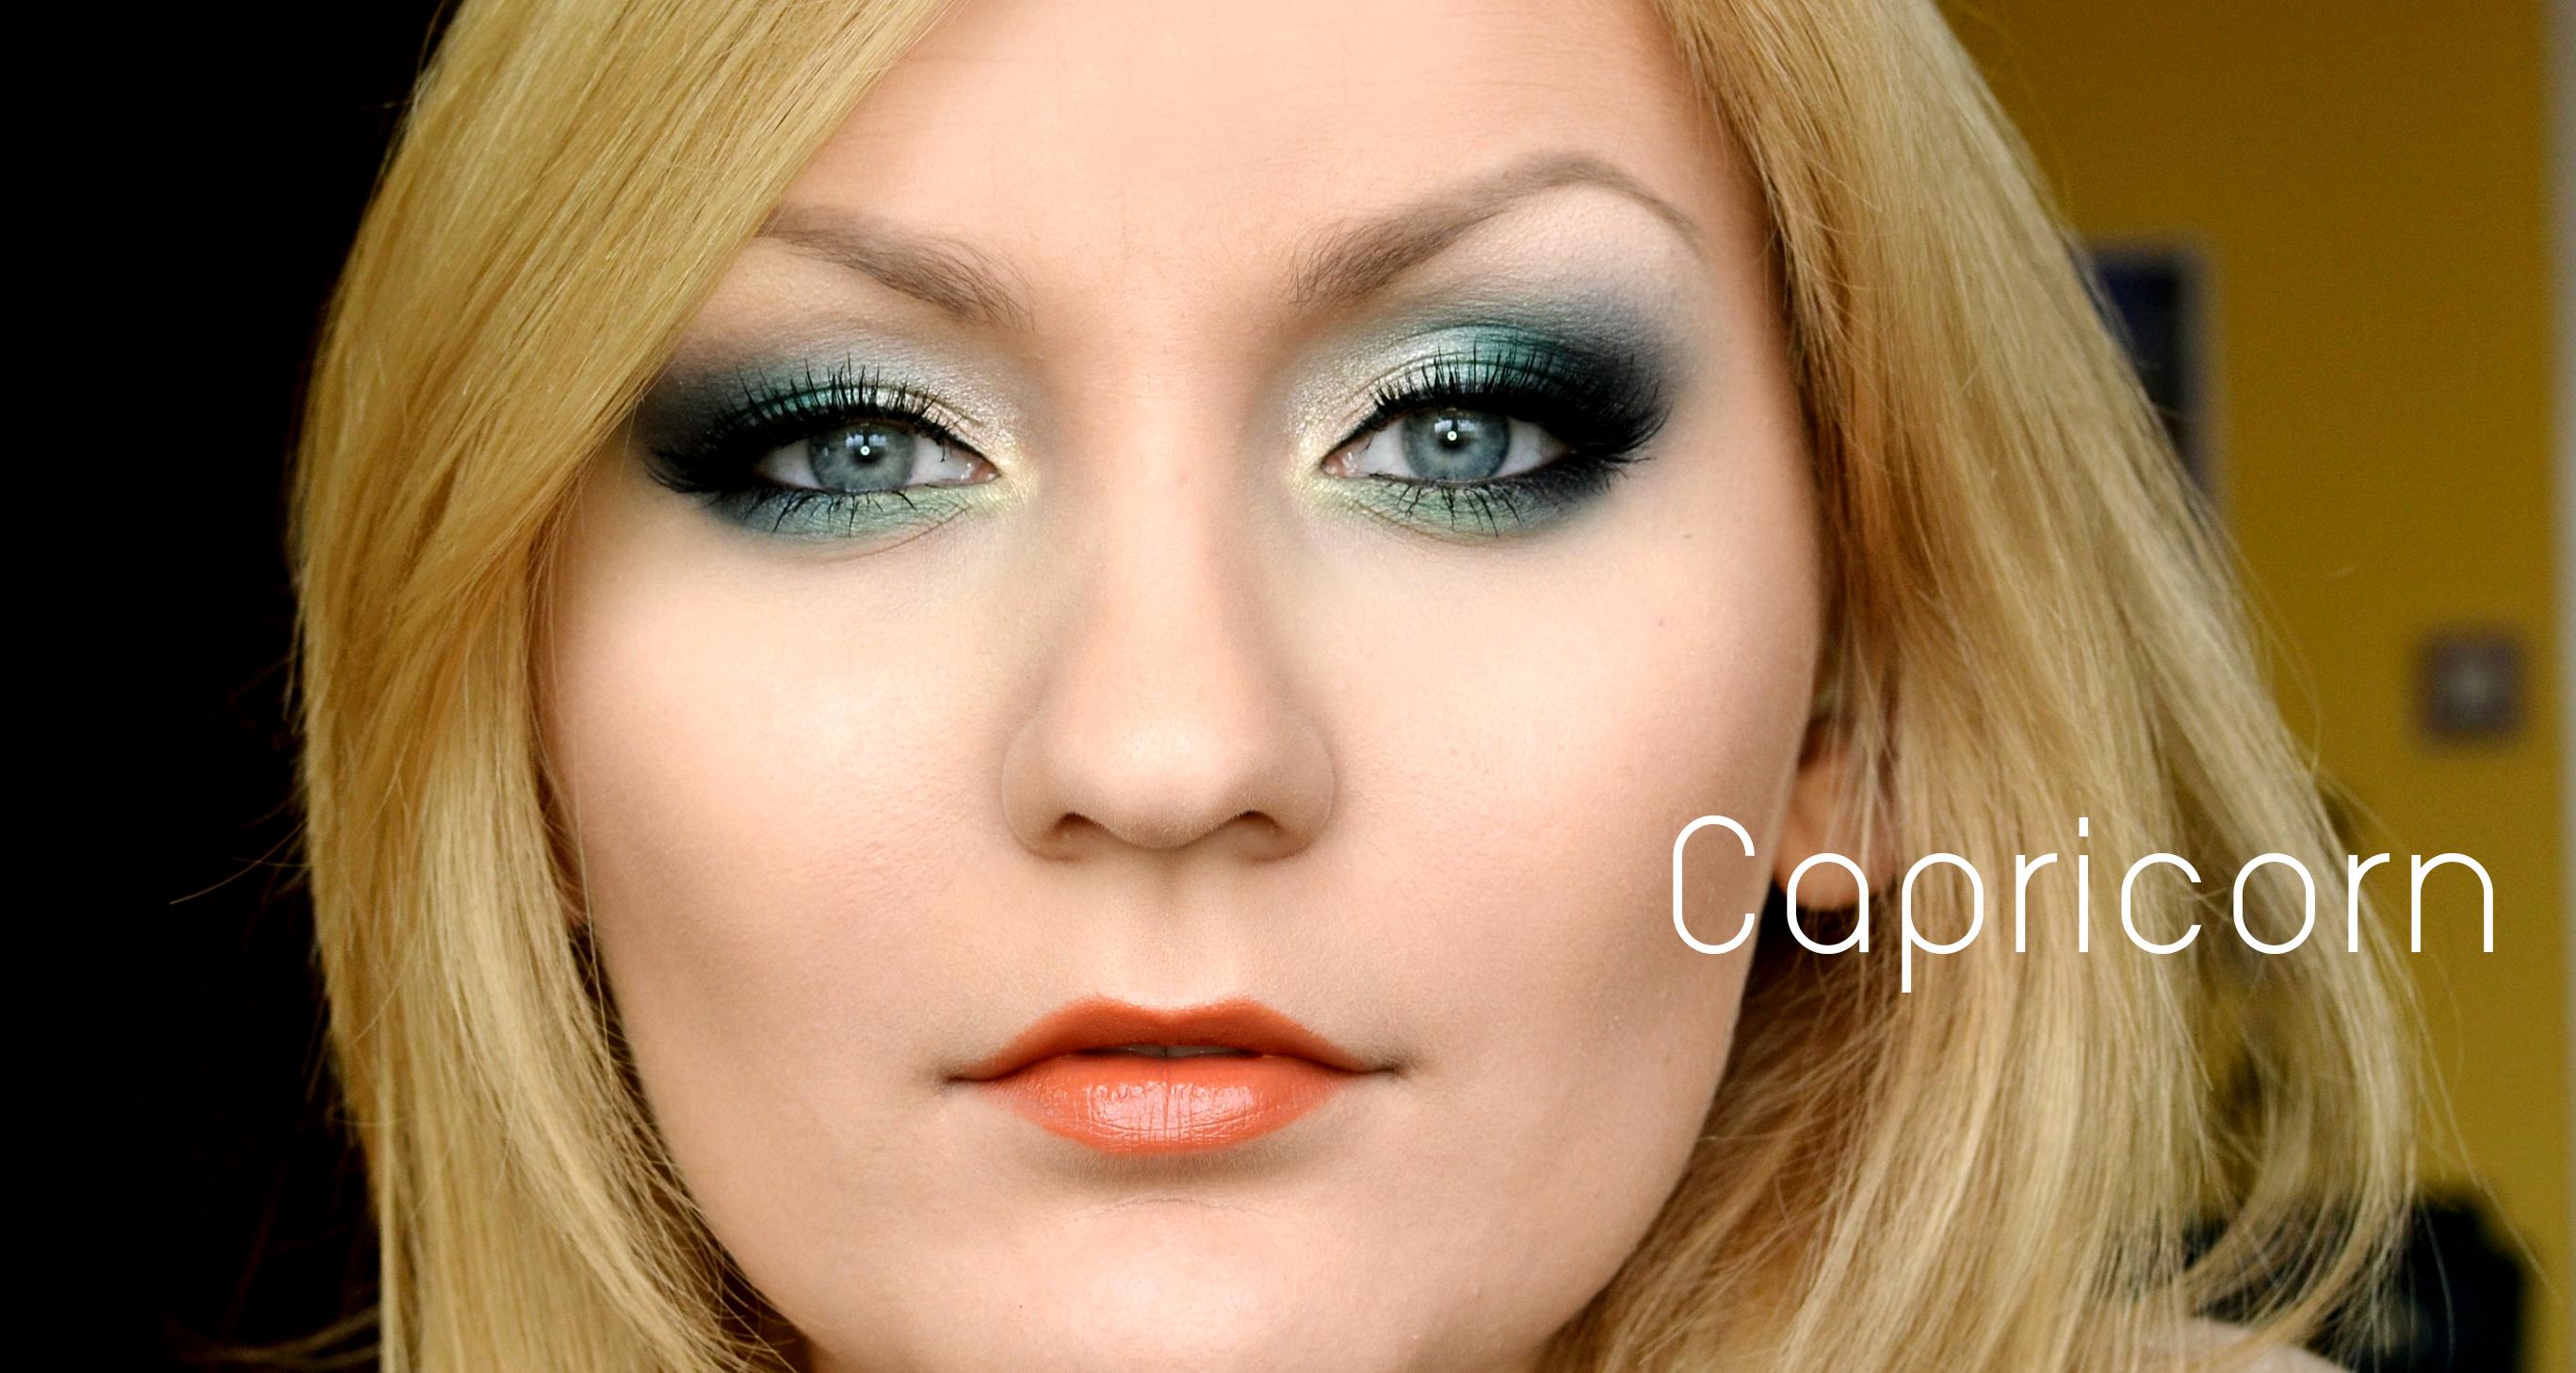 Zodiac Gemstones Makeup 7